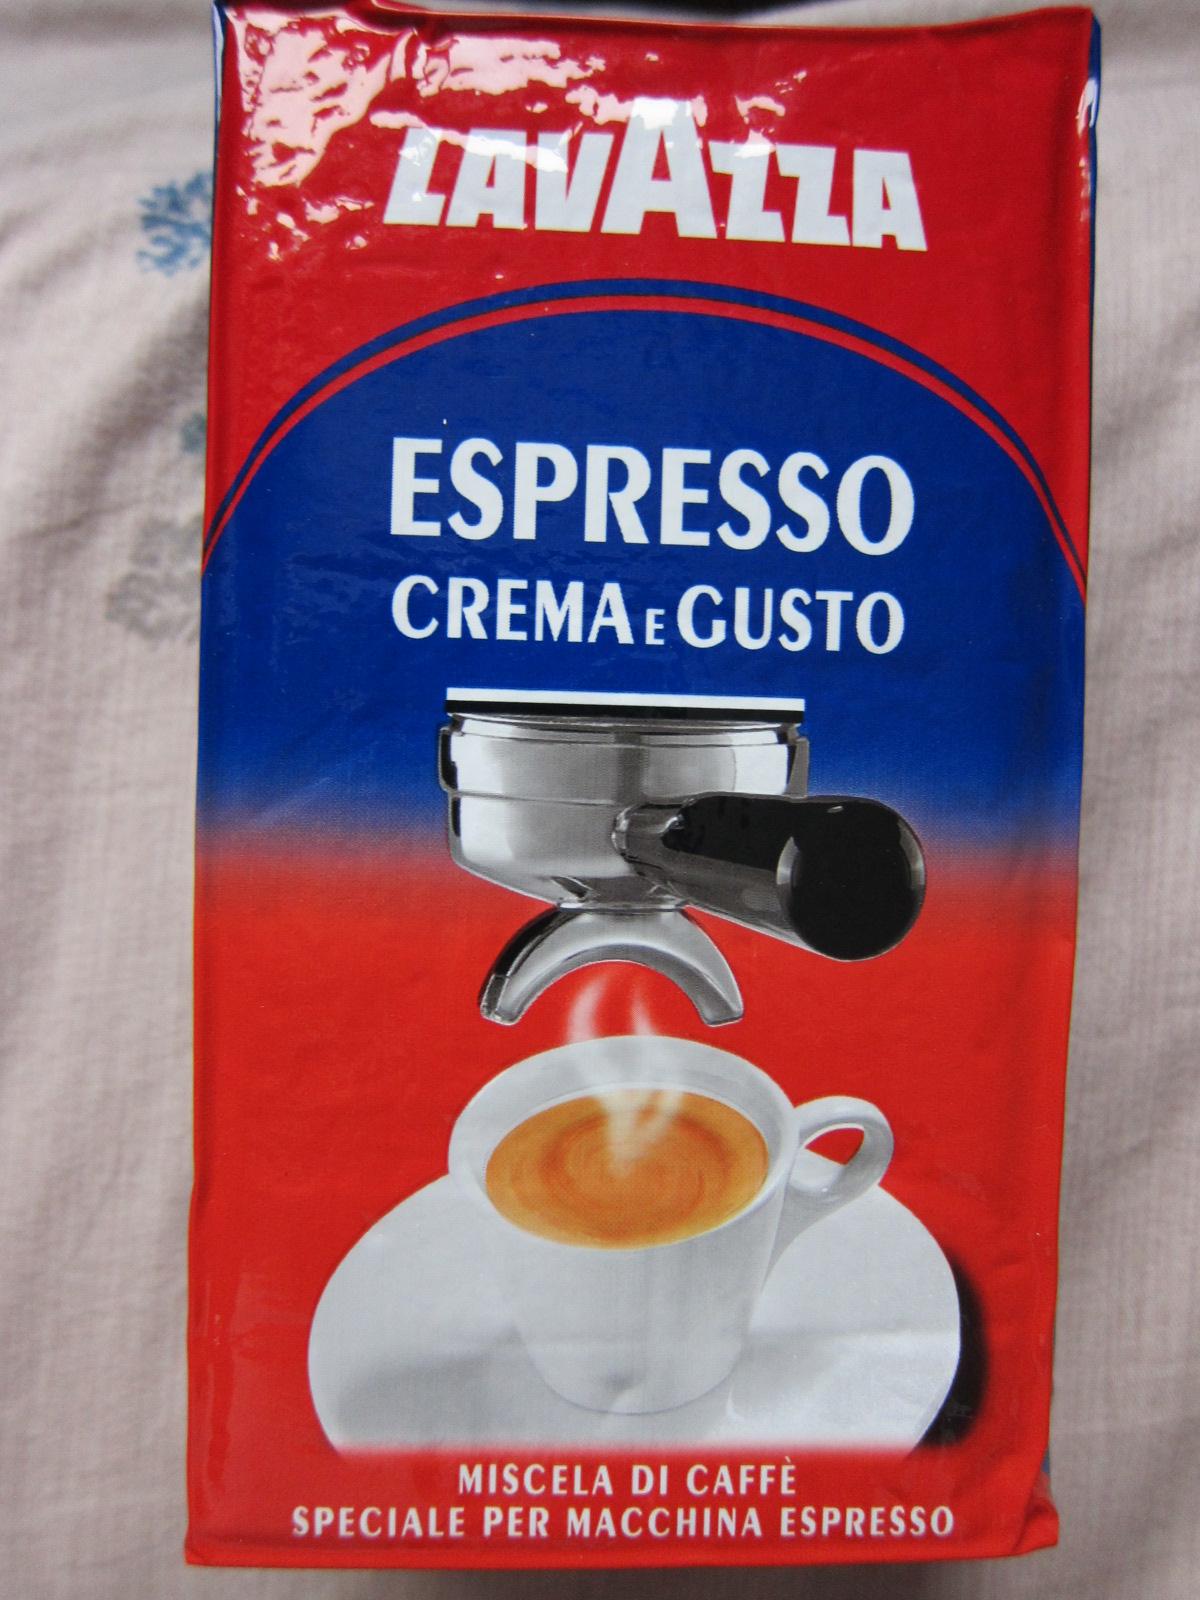 skymeme: [咖啡]♥義大利♥咖啡♥金杯咖啡& LAVAZZA & ILLY & QUALITA♥